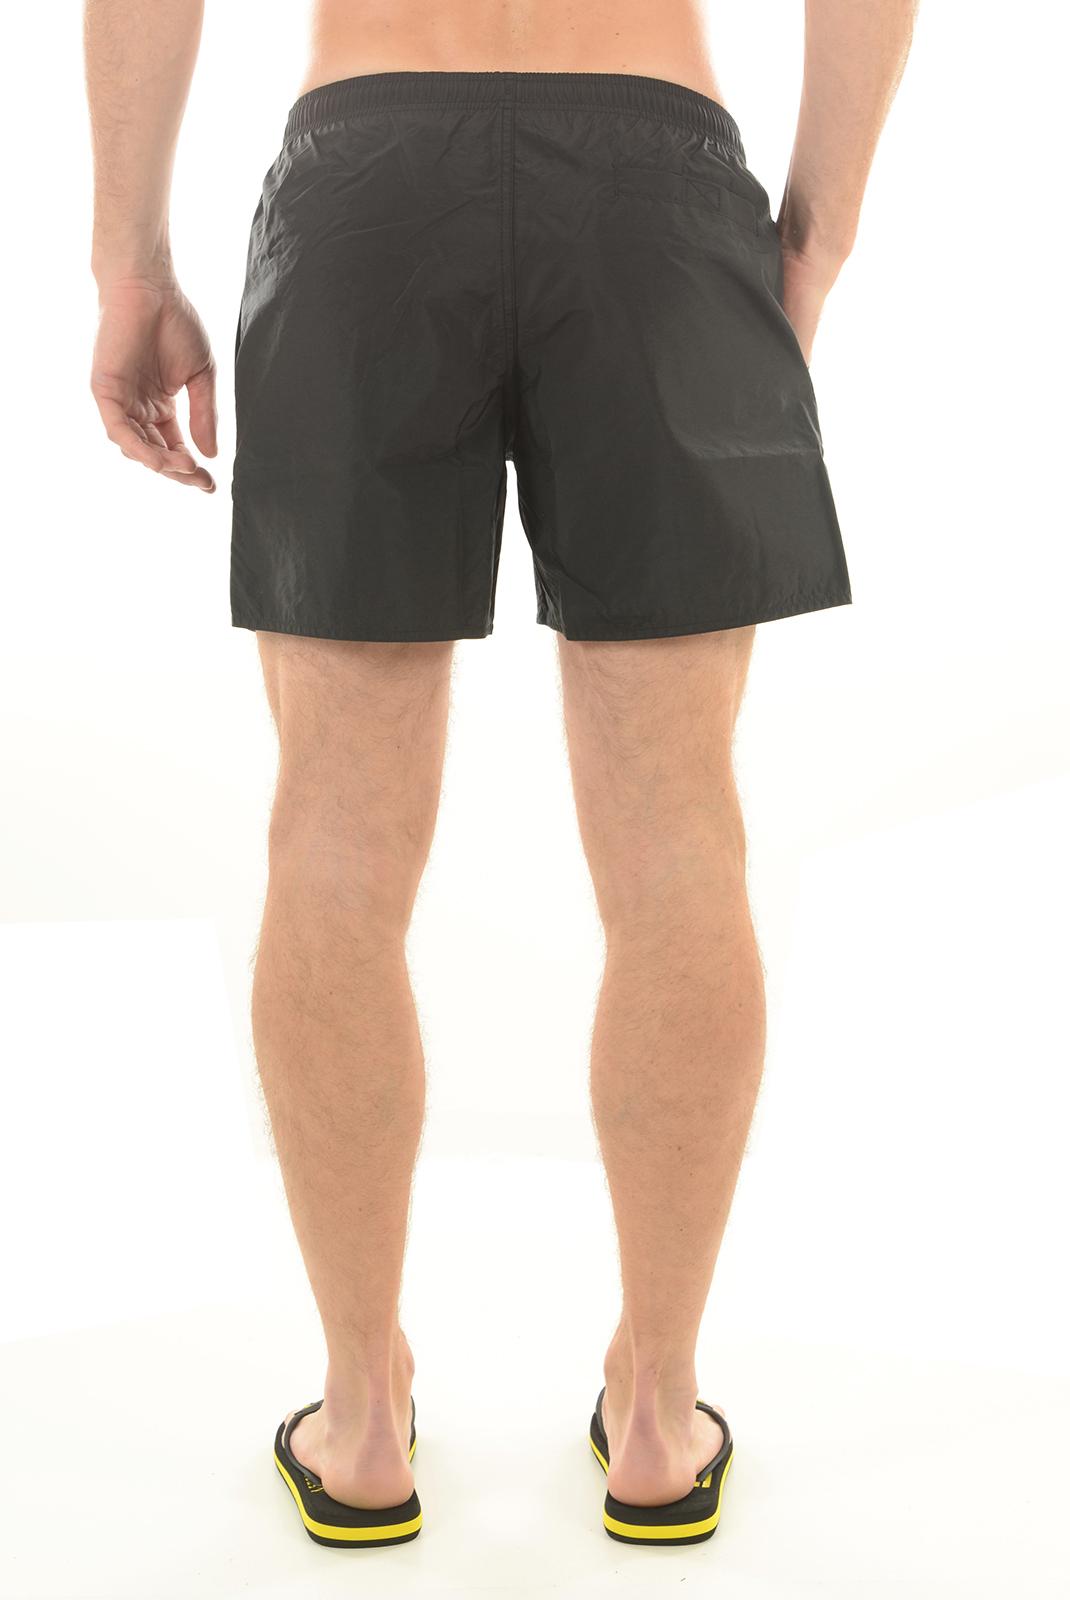 Shorts de bain  Emporio armani 902000 6P726 BLACK 00020